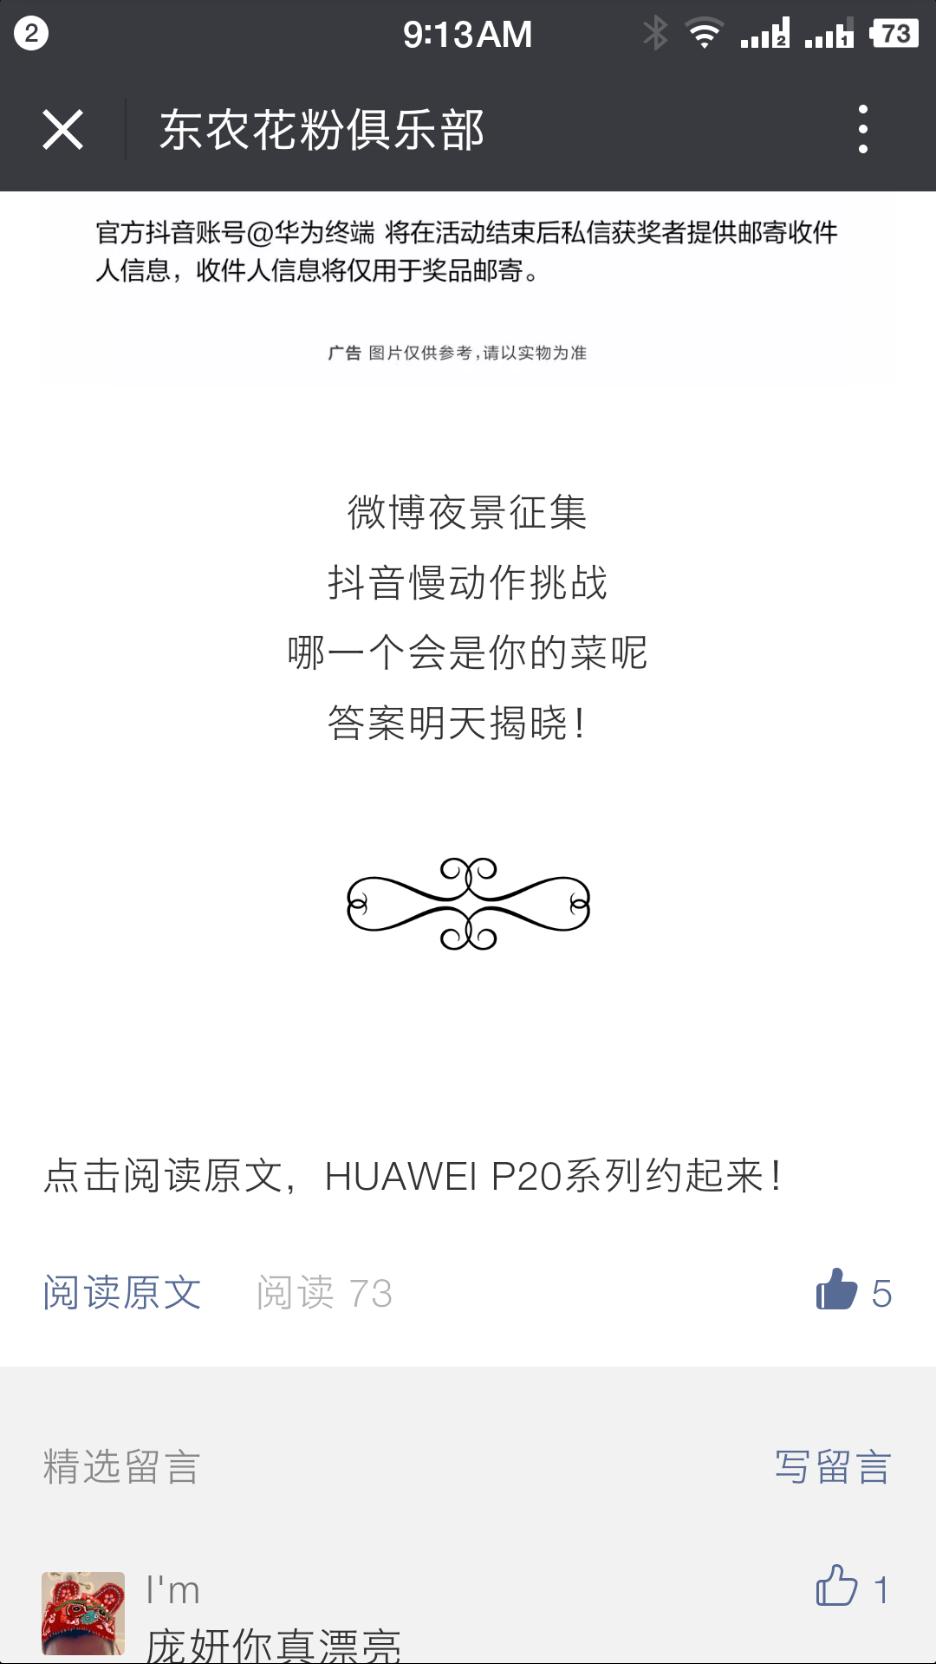 Screenshot_2019-02-07-09-13-29-970_WeChat.png